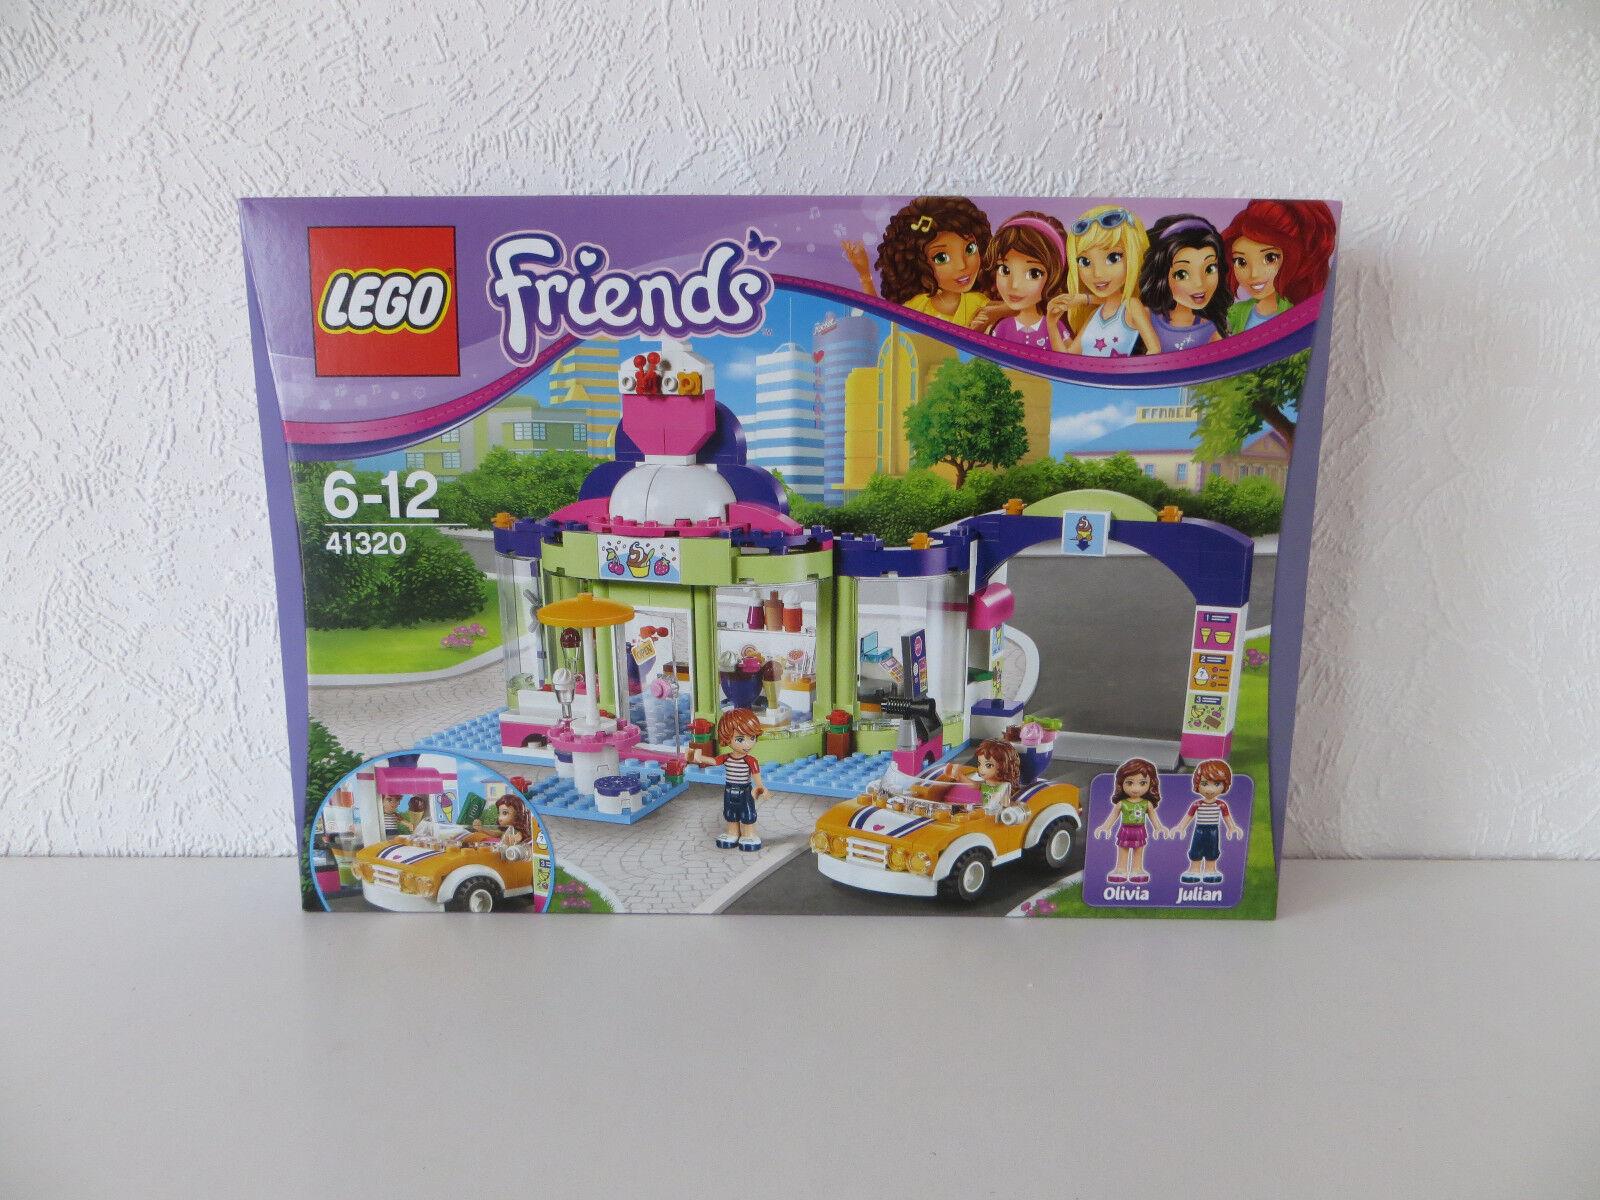 Lego Friends 41320 Heartlake Heartlake Heartlake Joghurteisdiele 13abed